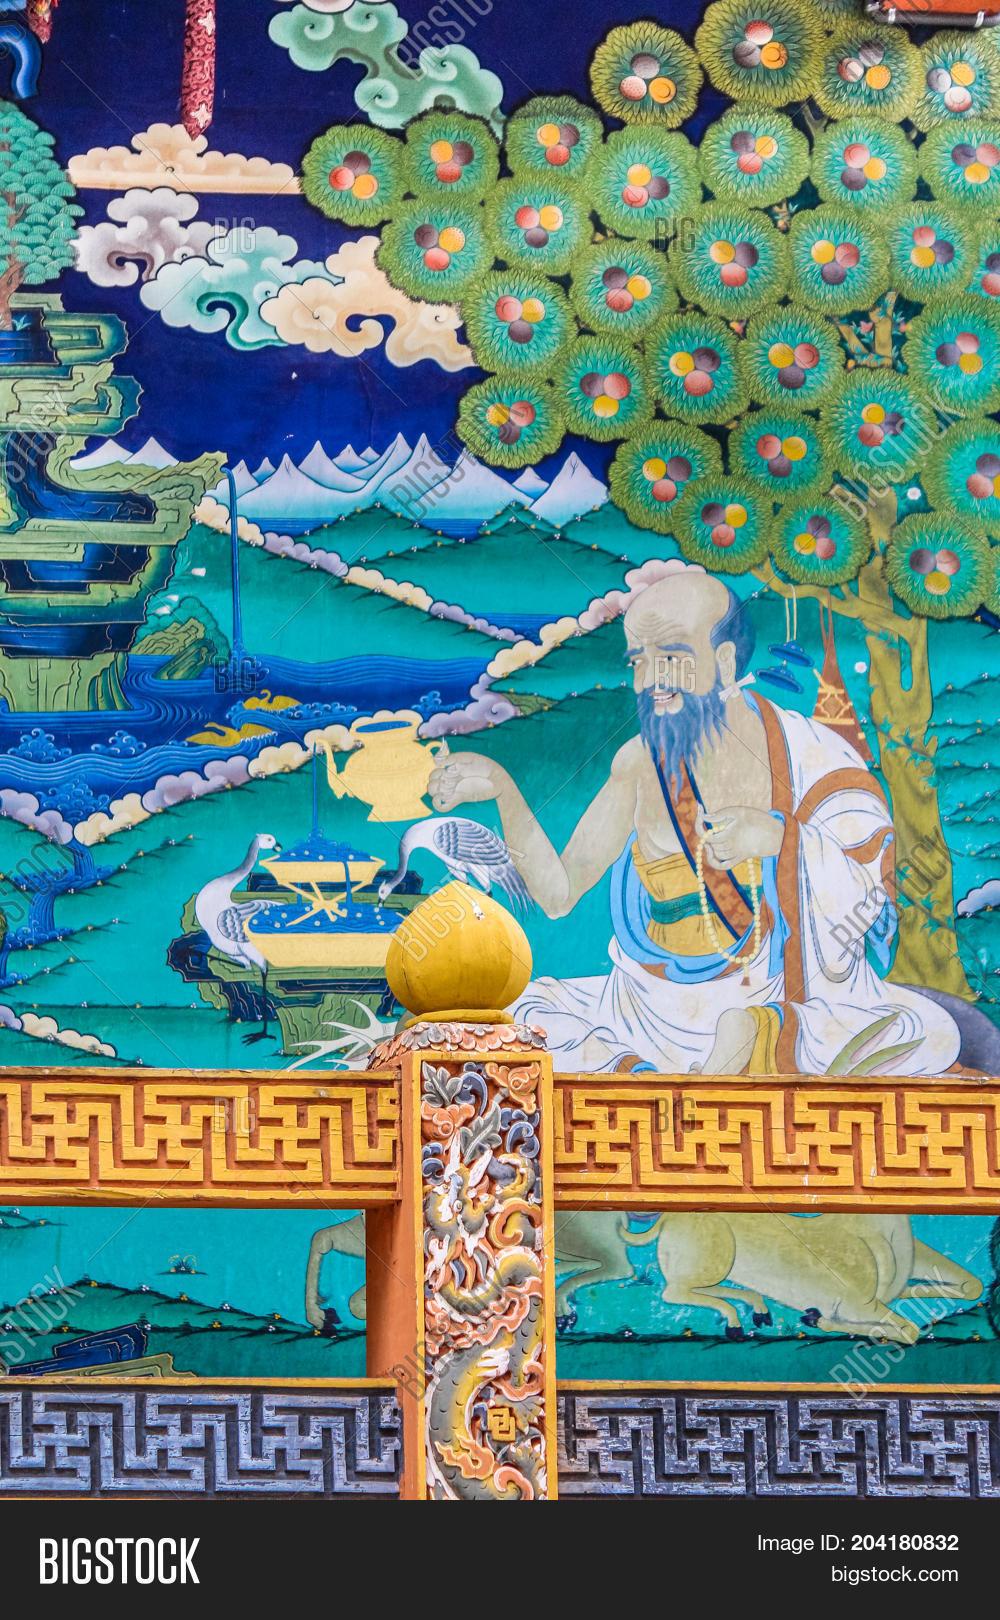 Punakha Bhutan Image Photo Free Trial Bigstock